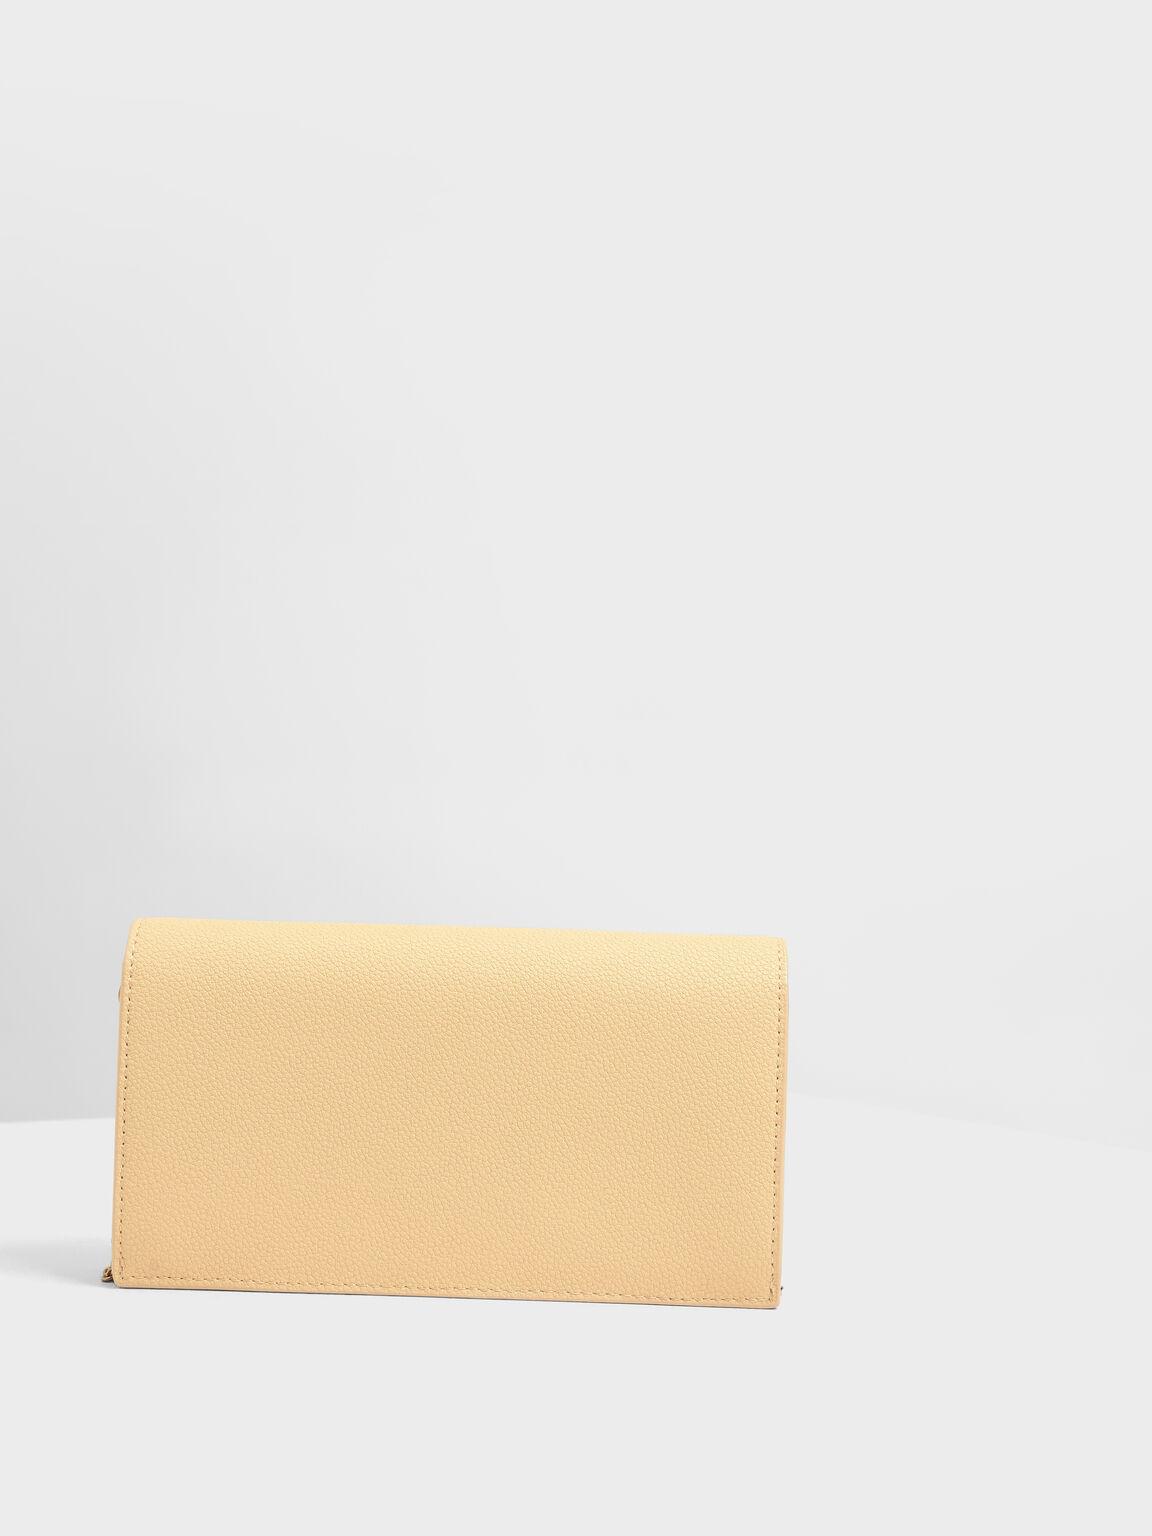 Metal Push Lock Long Wallet, Yellow, hi-res